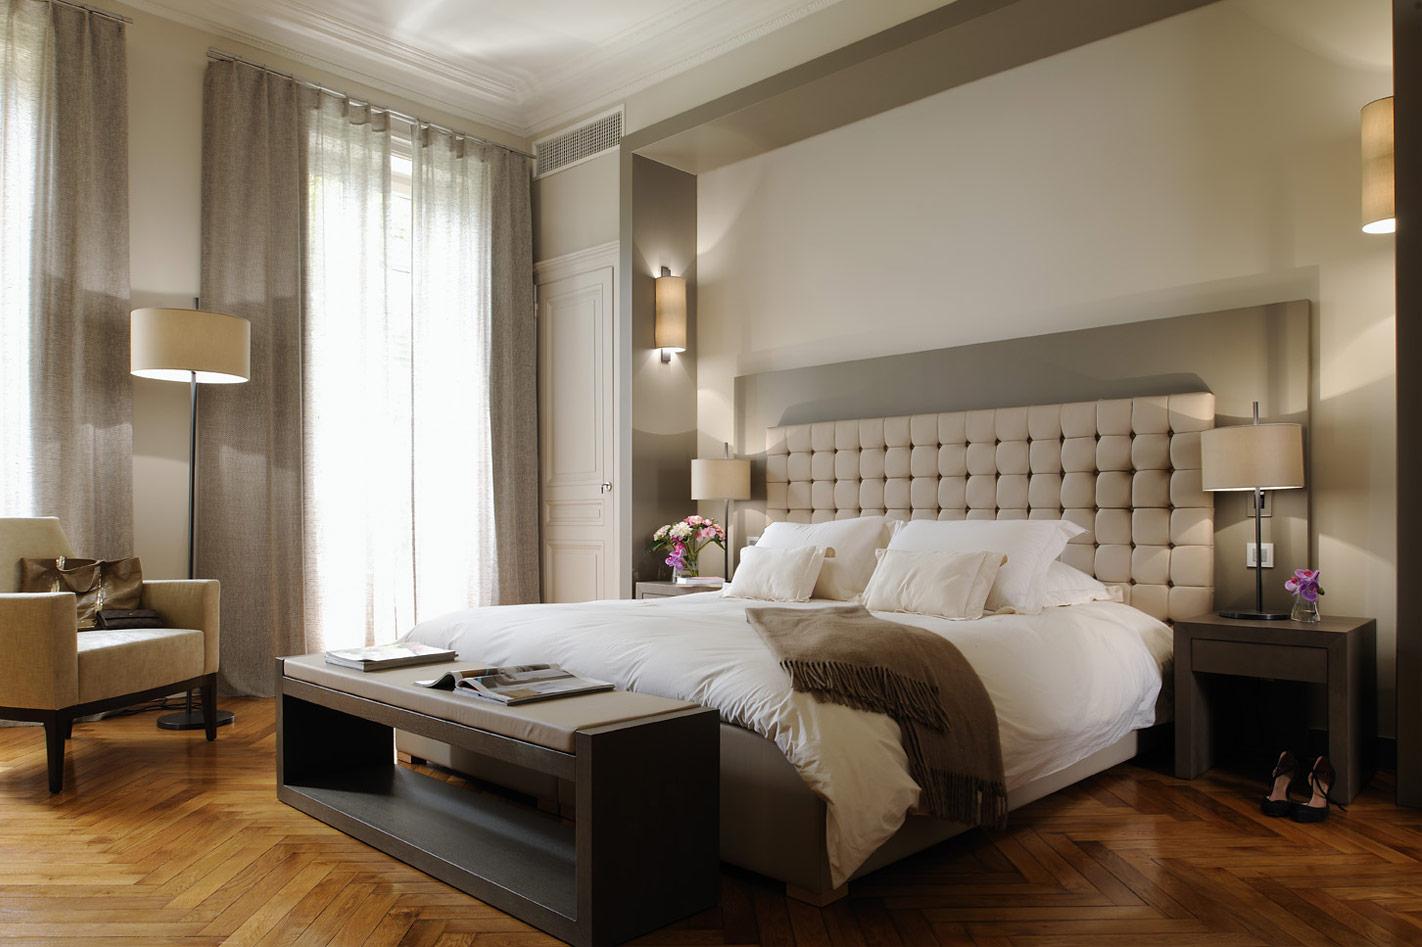 Интерьер спальни 14 кв.м.